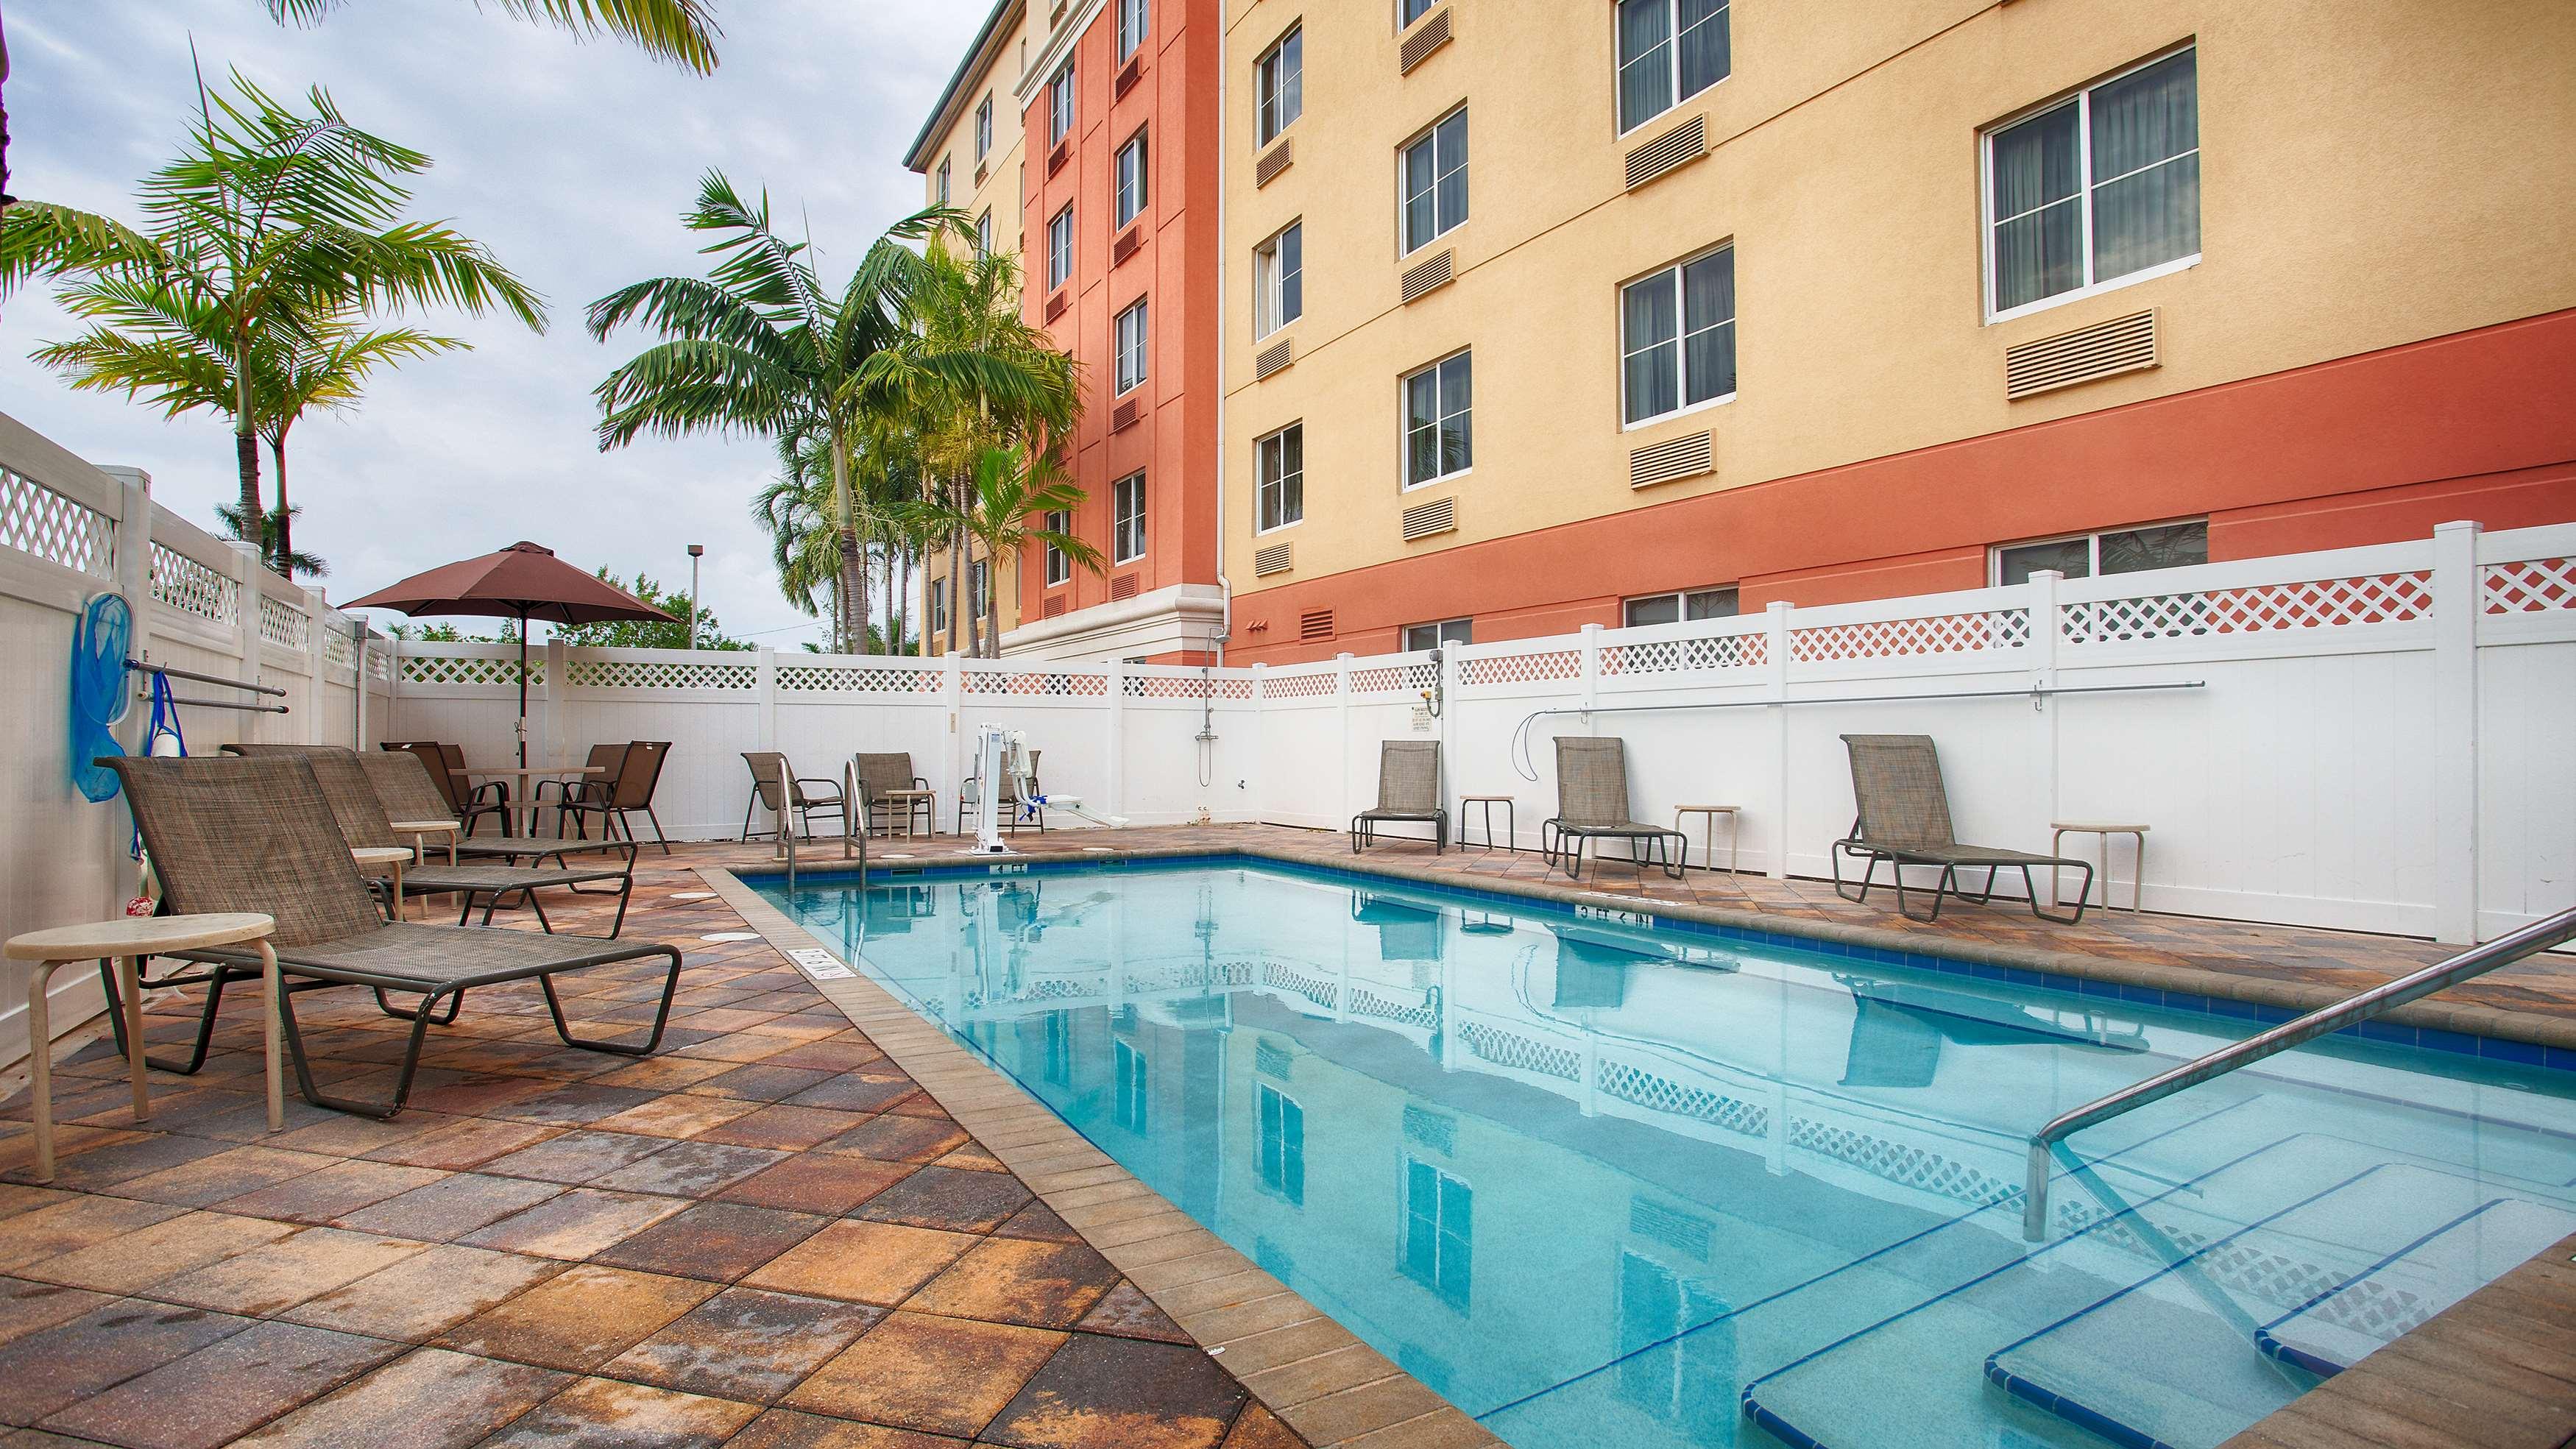 Best Western Plus Fort Lauderdale Airport South Inn & Suites image 6